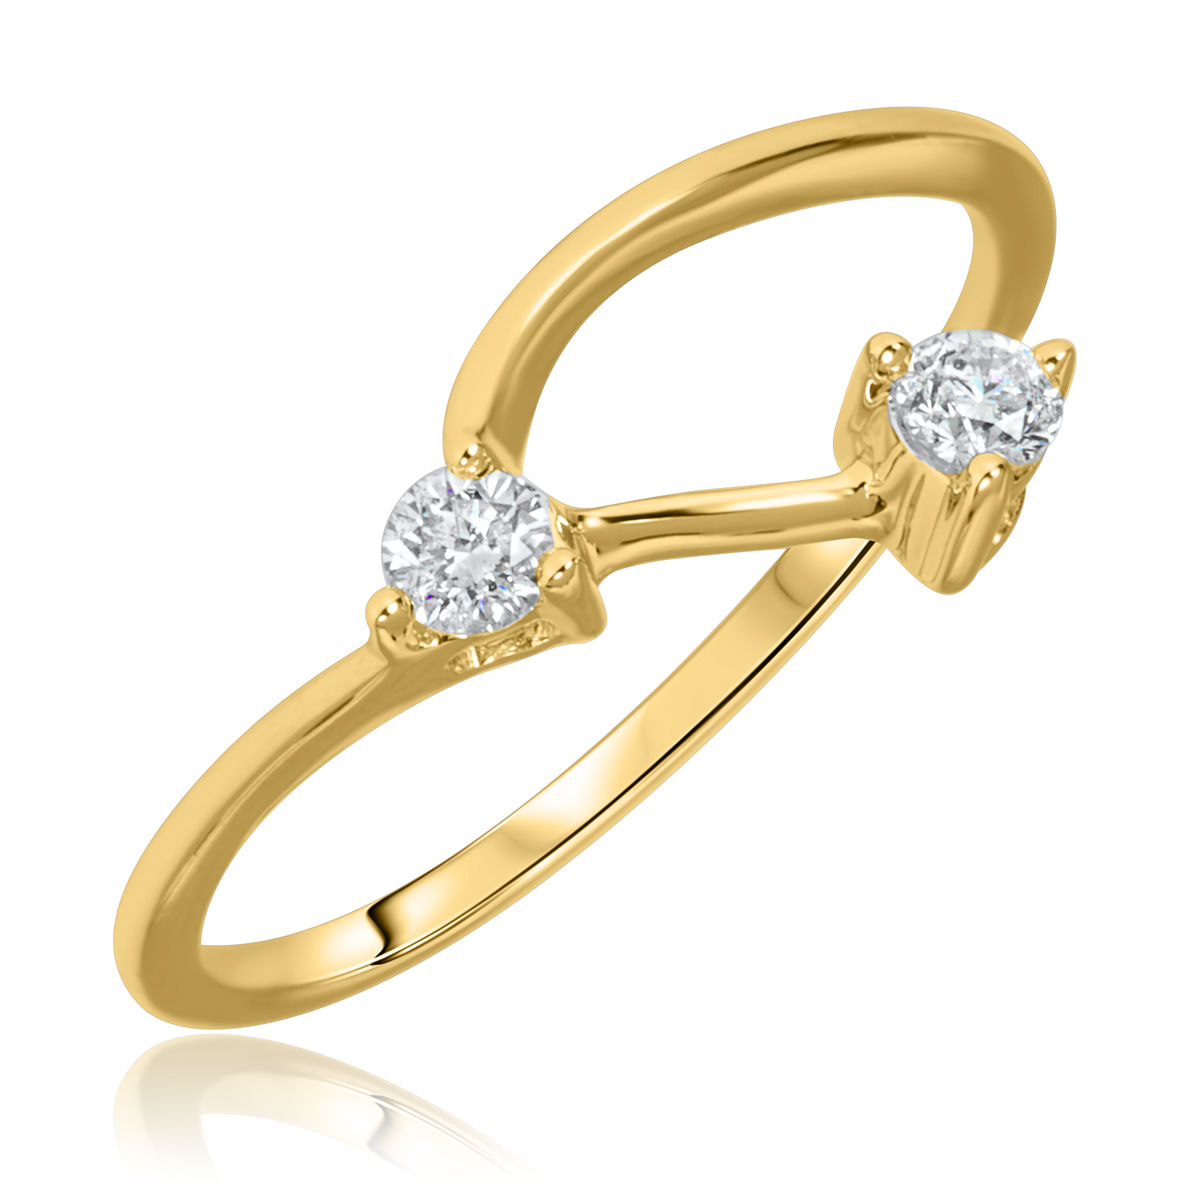 1/5 Carat T.W. Round Cut Diamond Ladies Wedding Band 10K Yellow Gold- Size 8